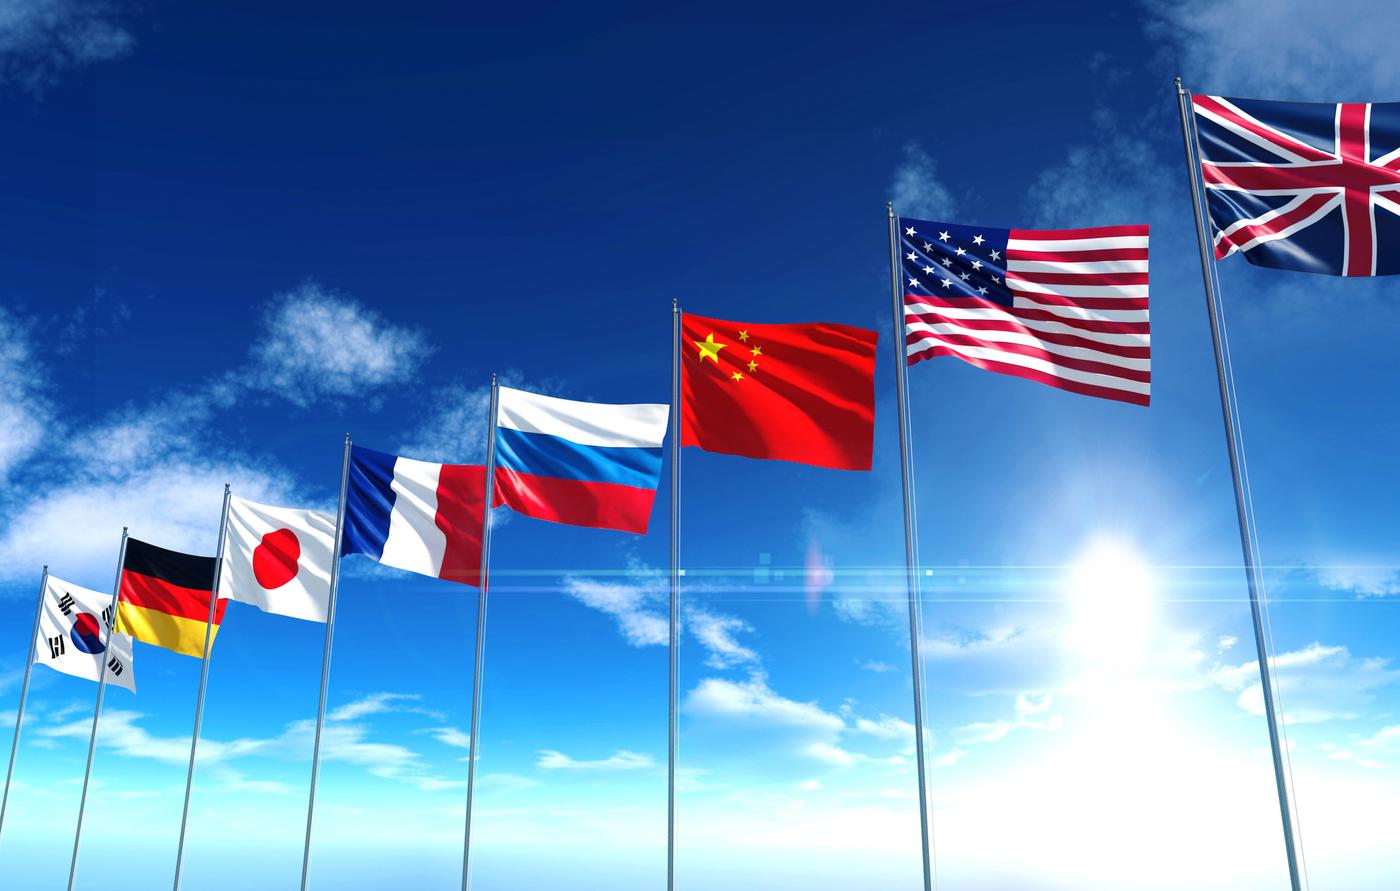 BDRC international school survey flags